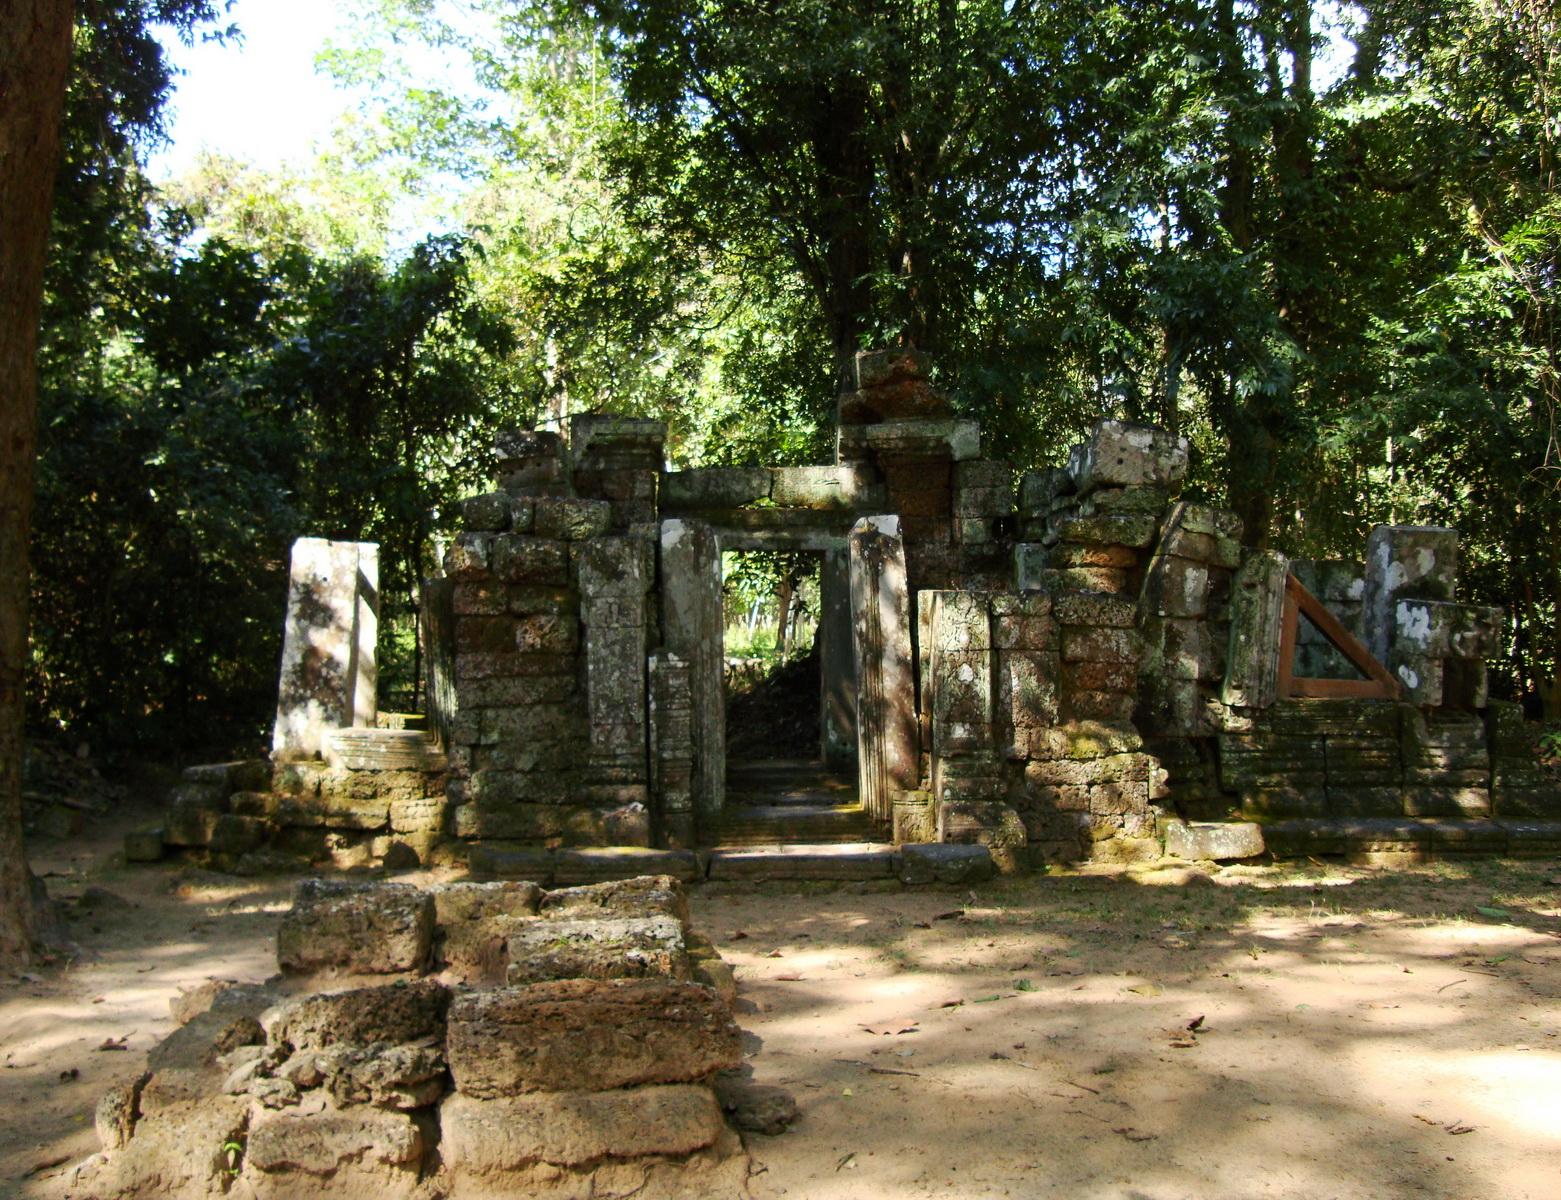 A Banteay Kdei Temple ruins Jan 2010 01